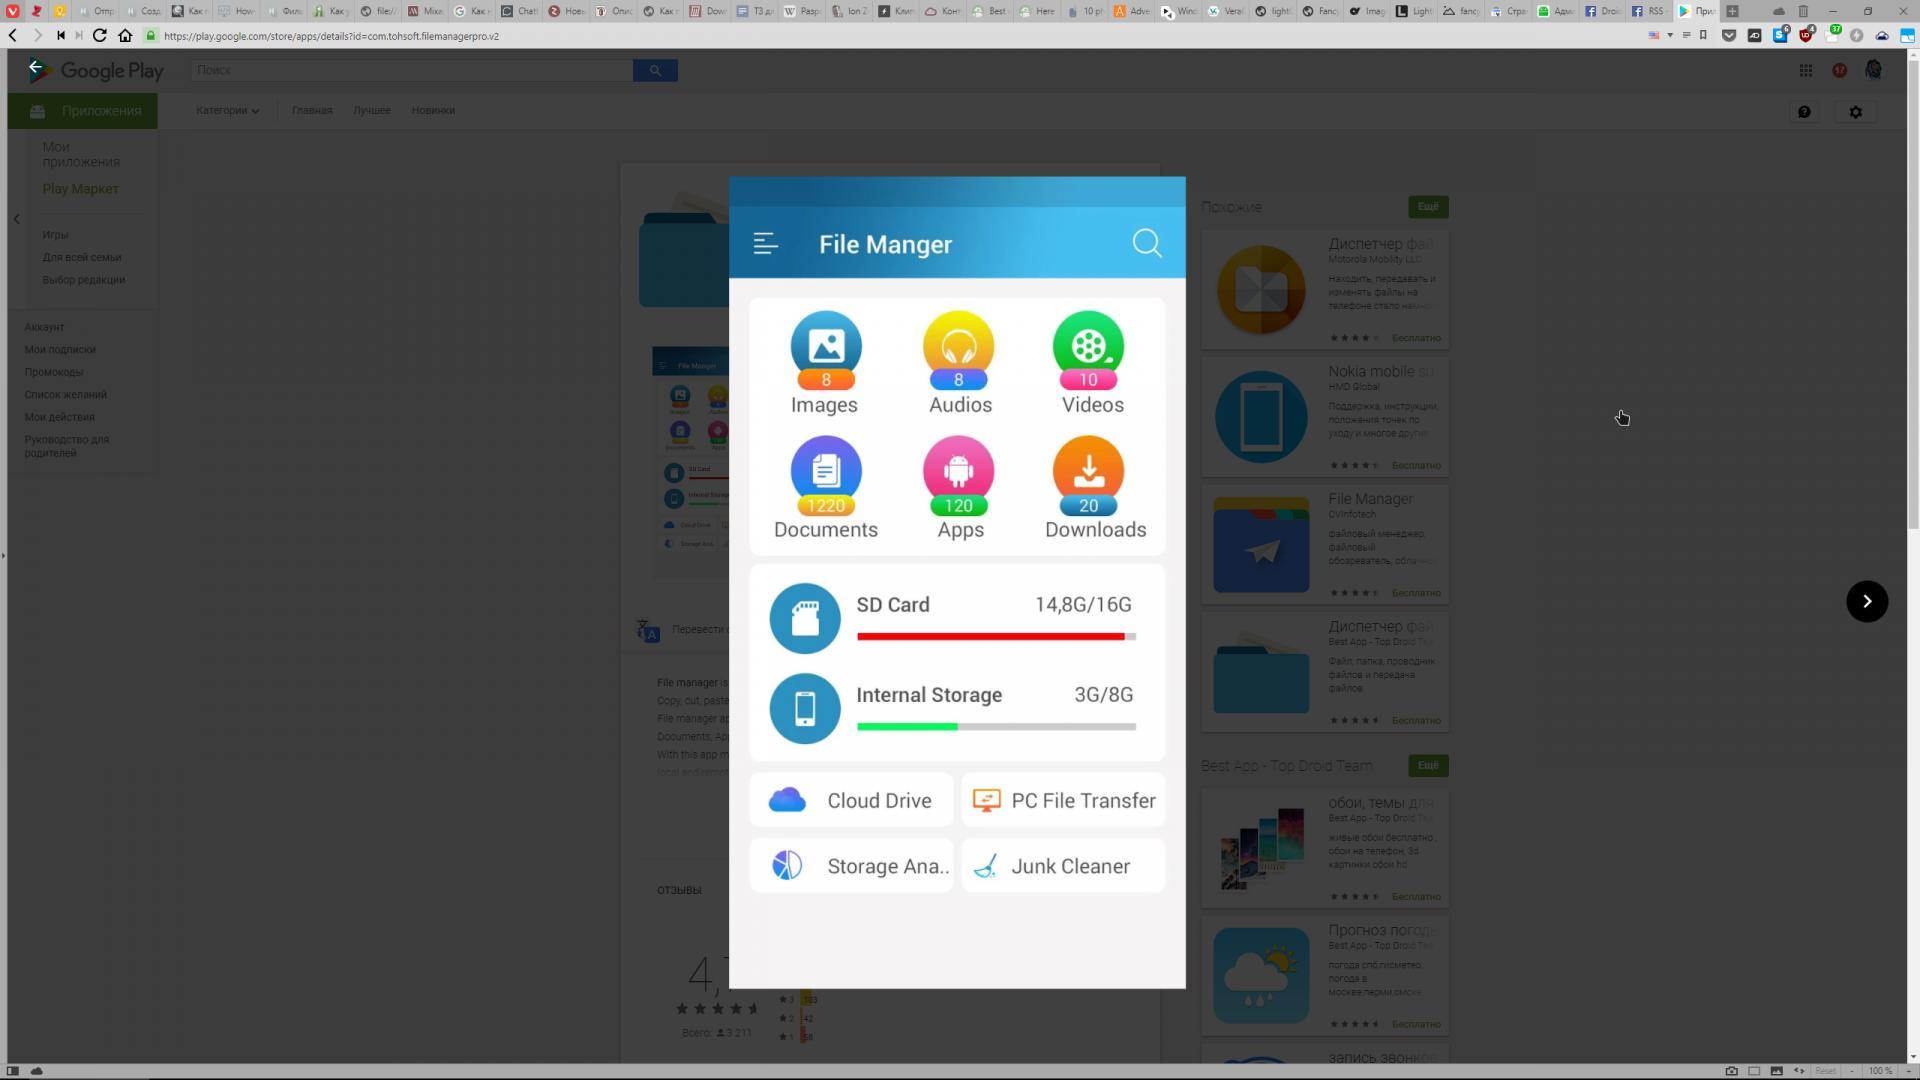 Google активно расширяет возможности Play Store — даты релиза приложений